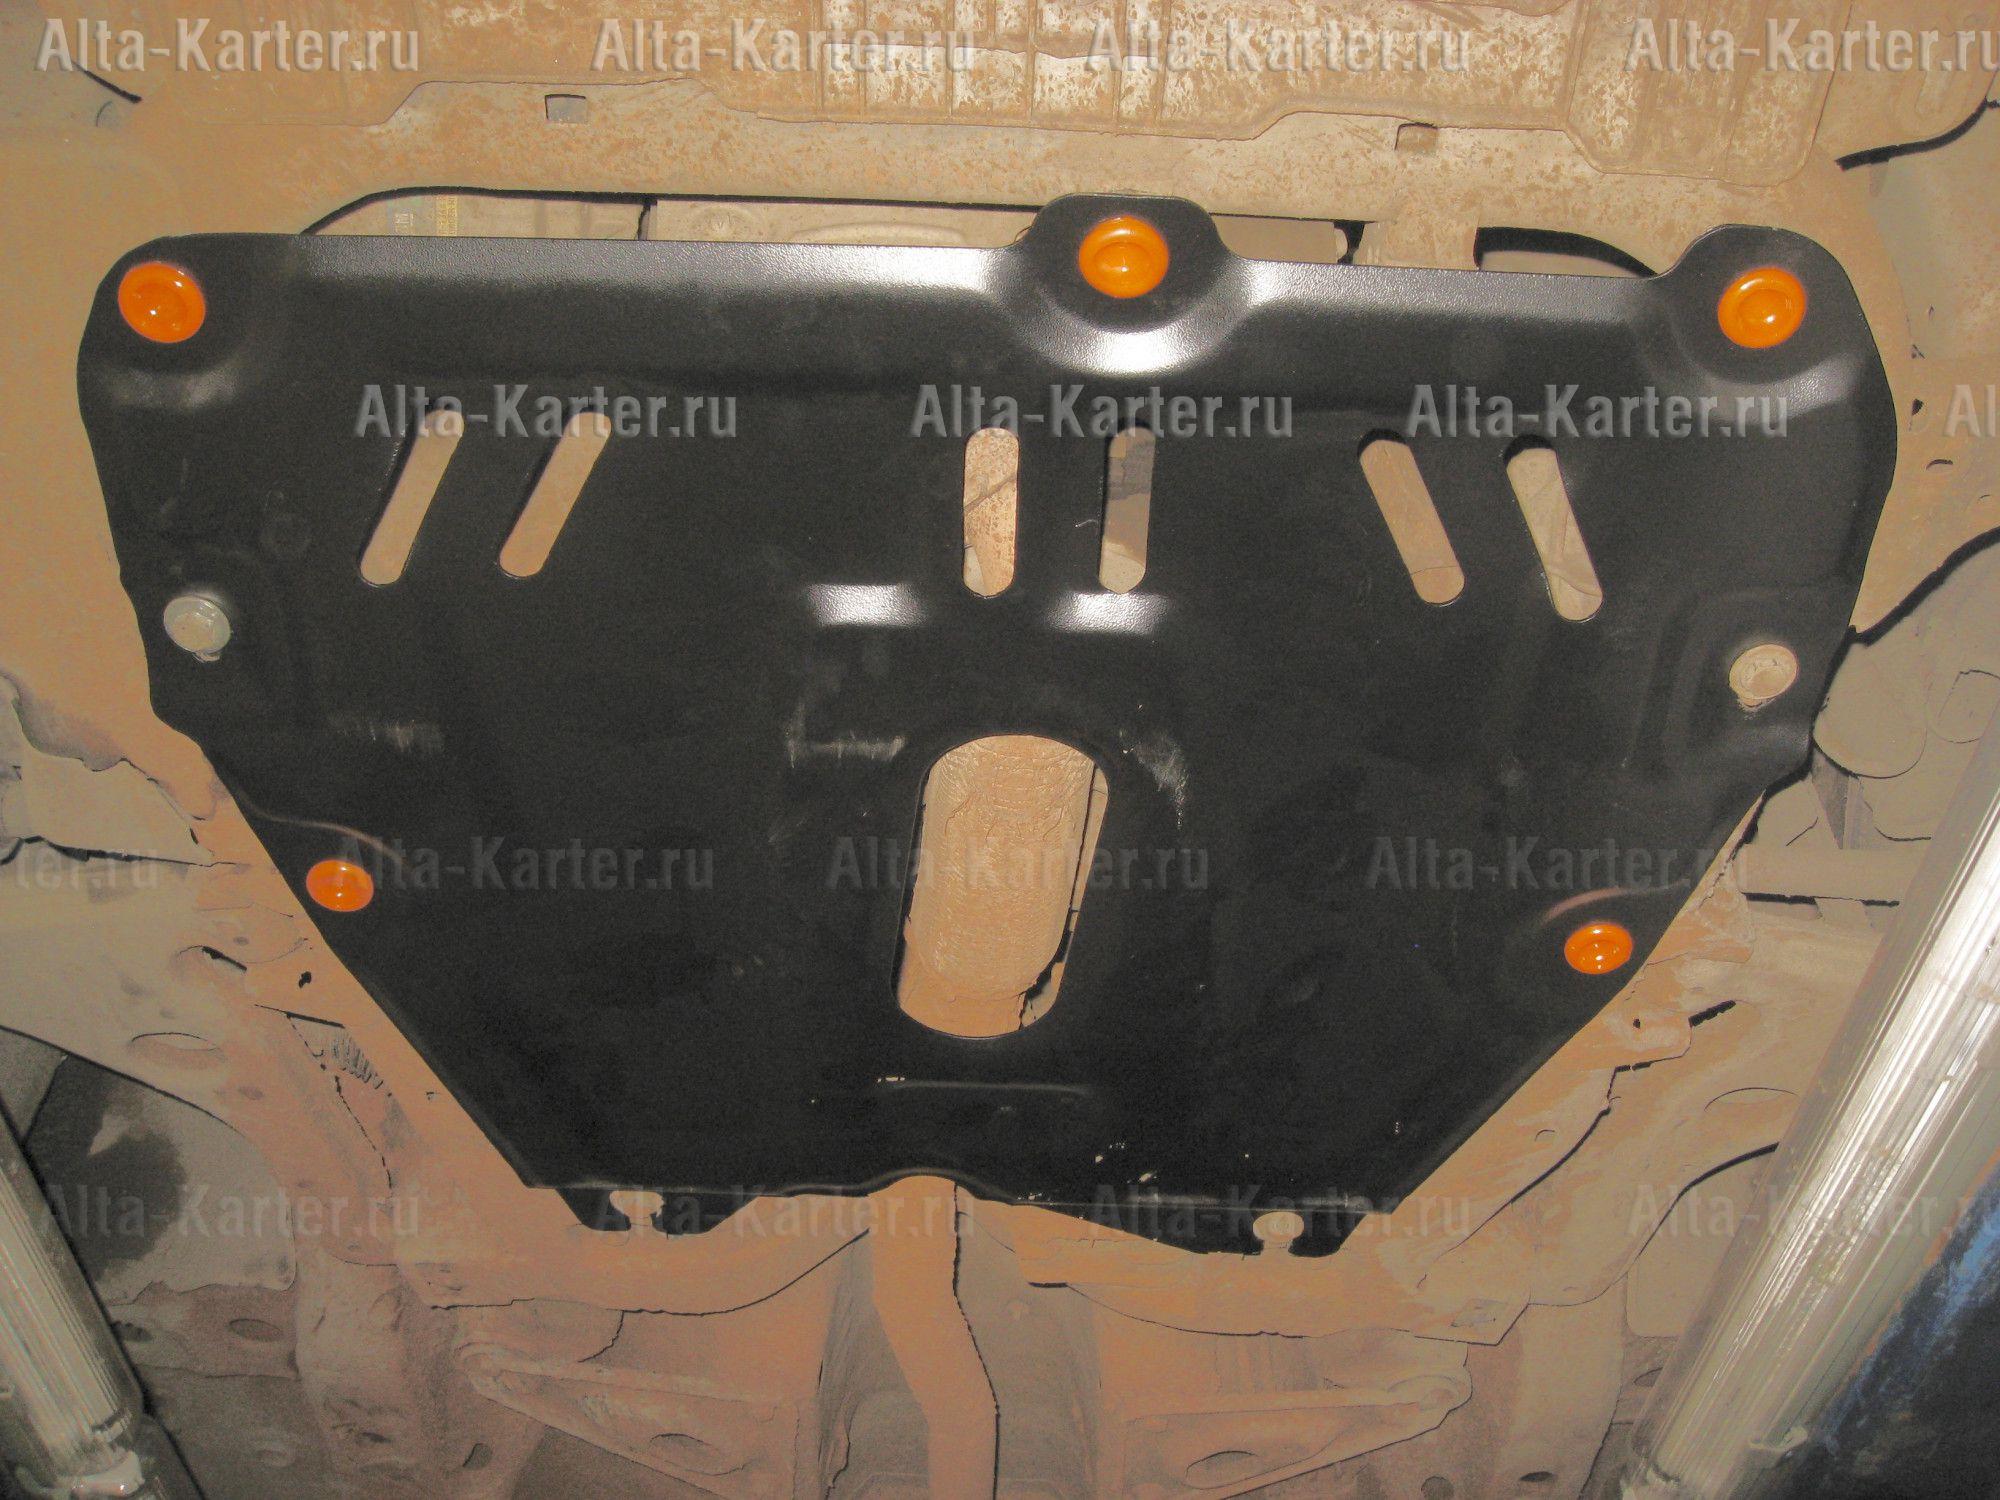 Защита Alfeco для картера и КПП Opel Astra H 2004-2010. Артикул ALF.16.02